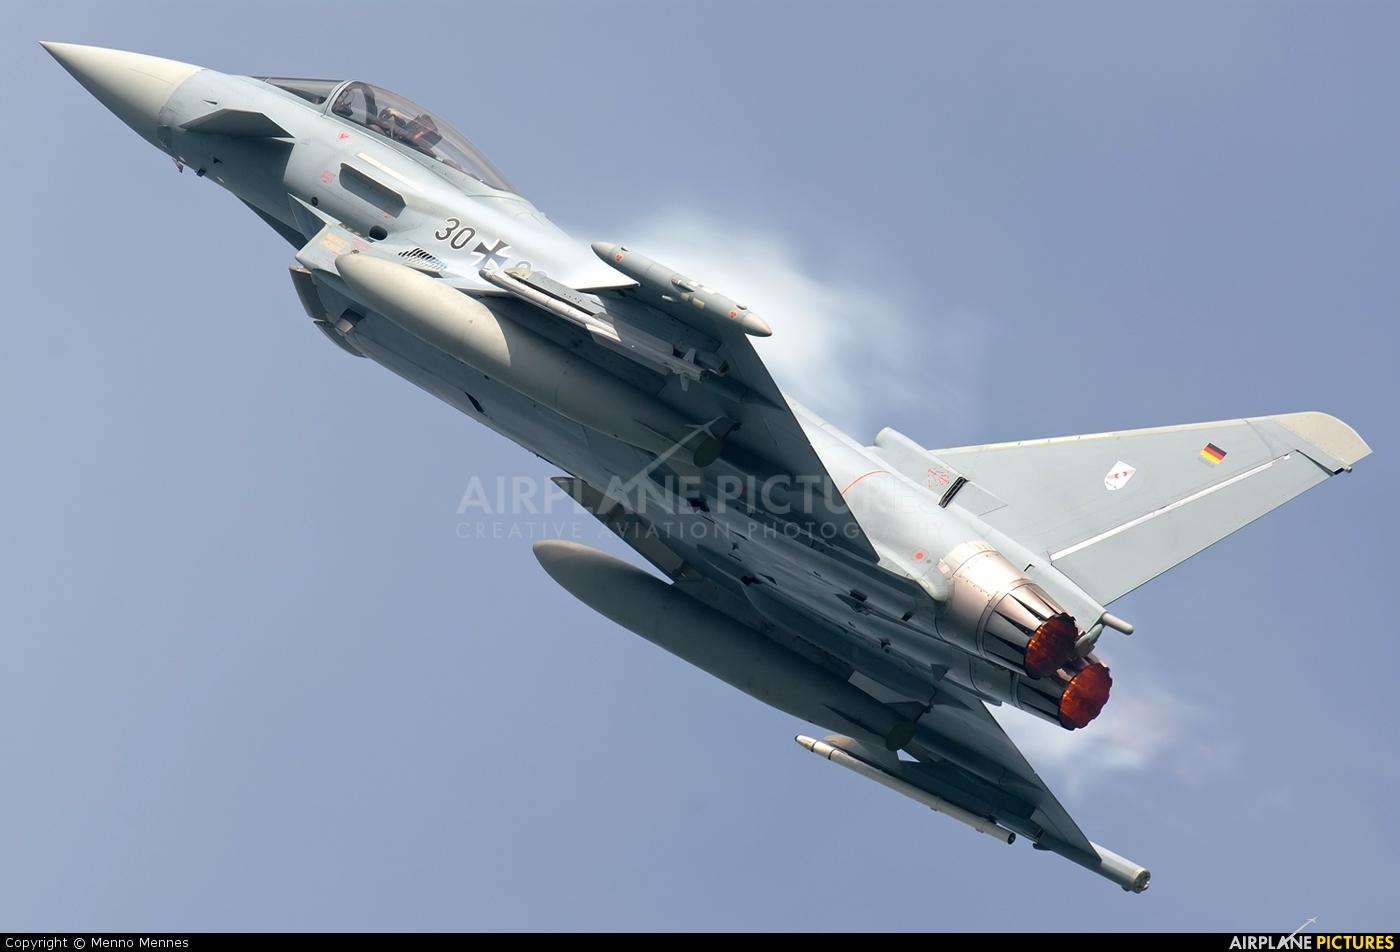 Germany - Air Force 30+98 aircraft at Leeuwarden